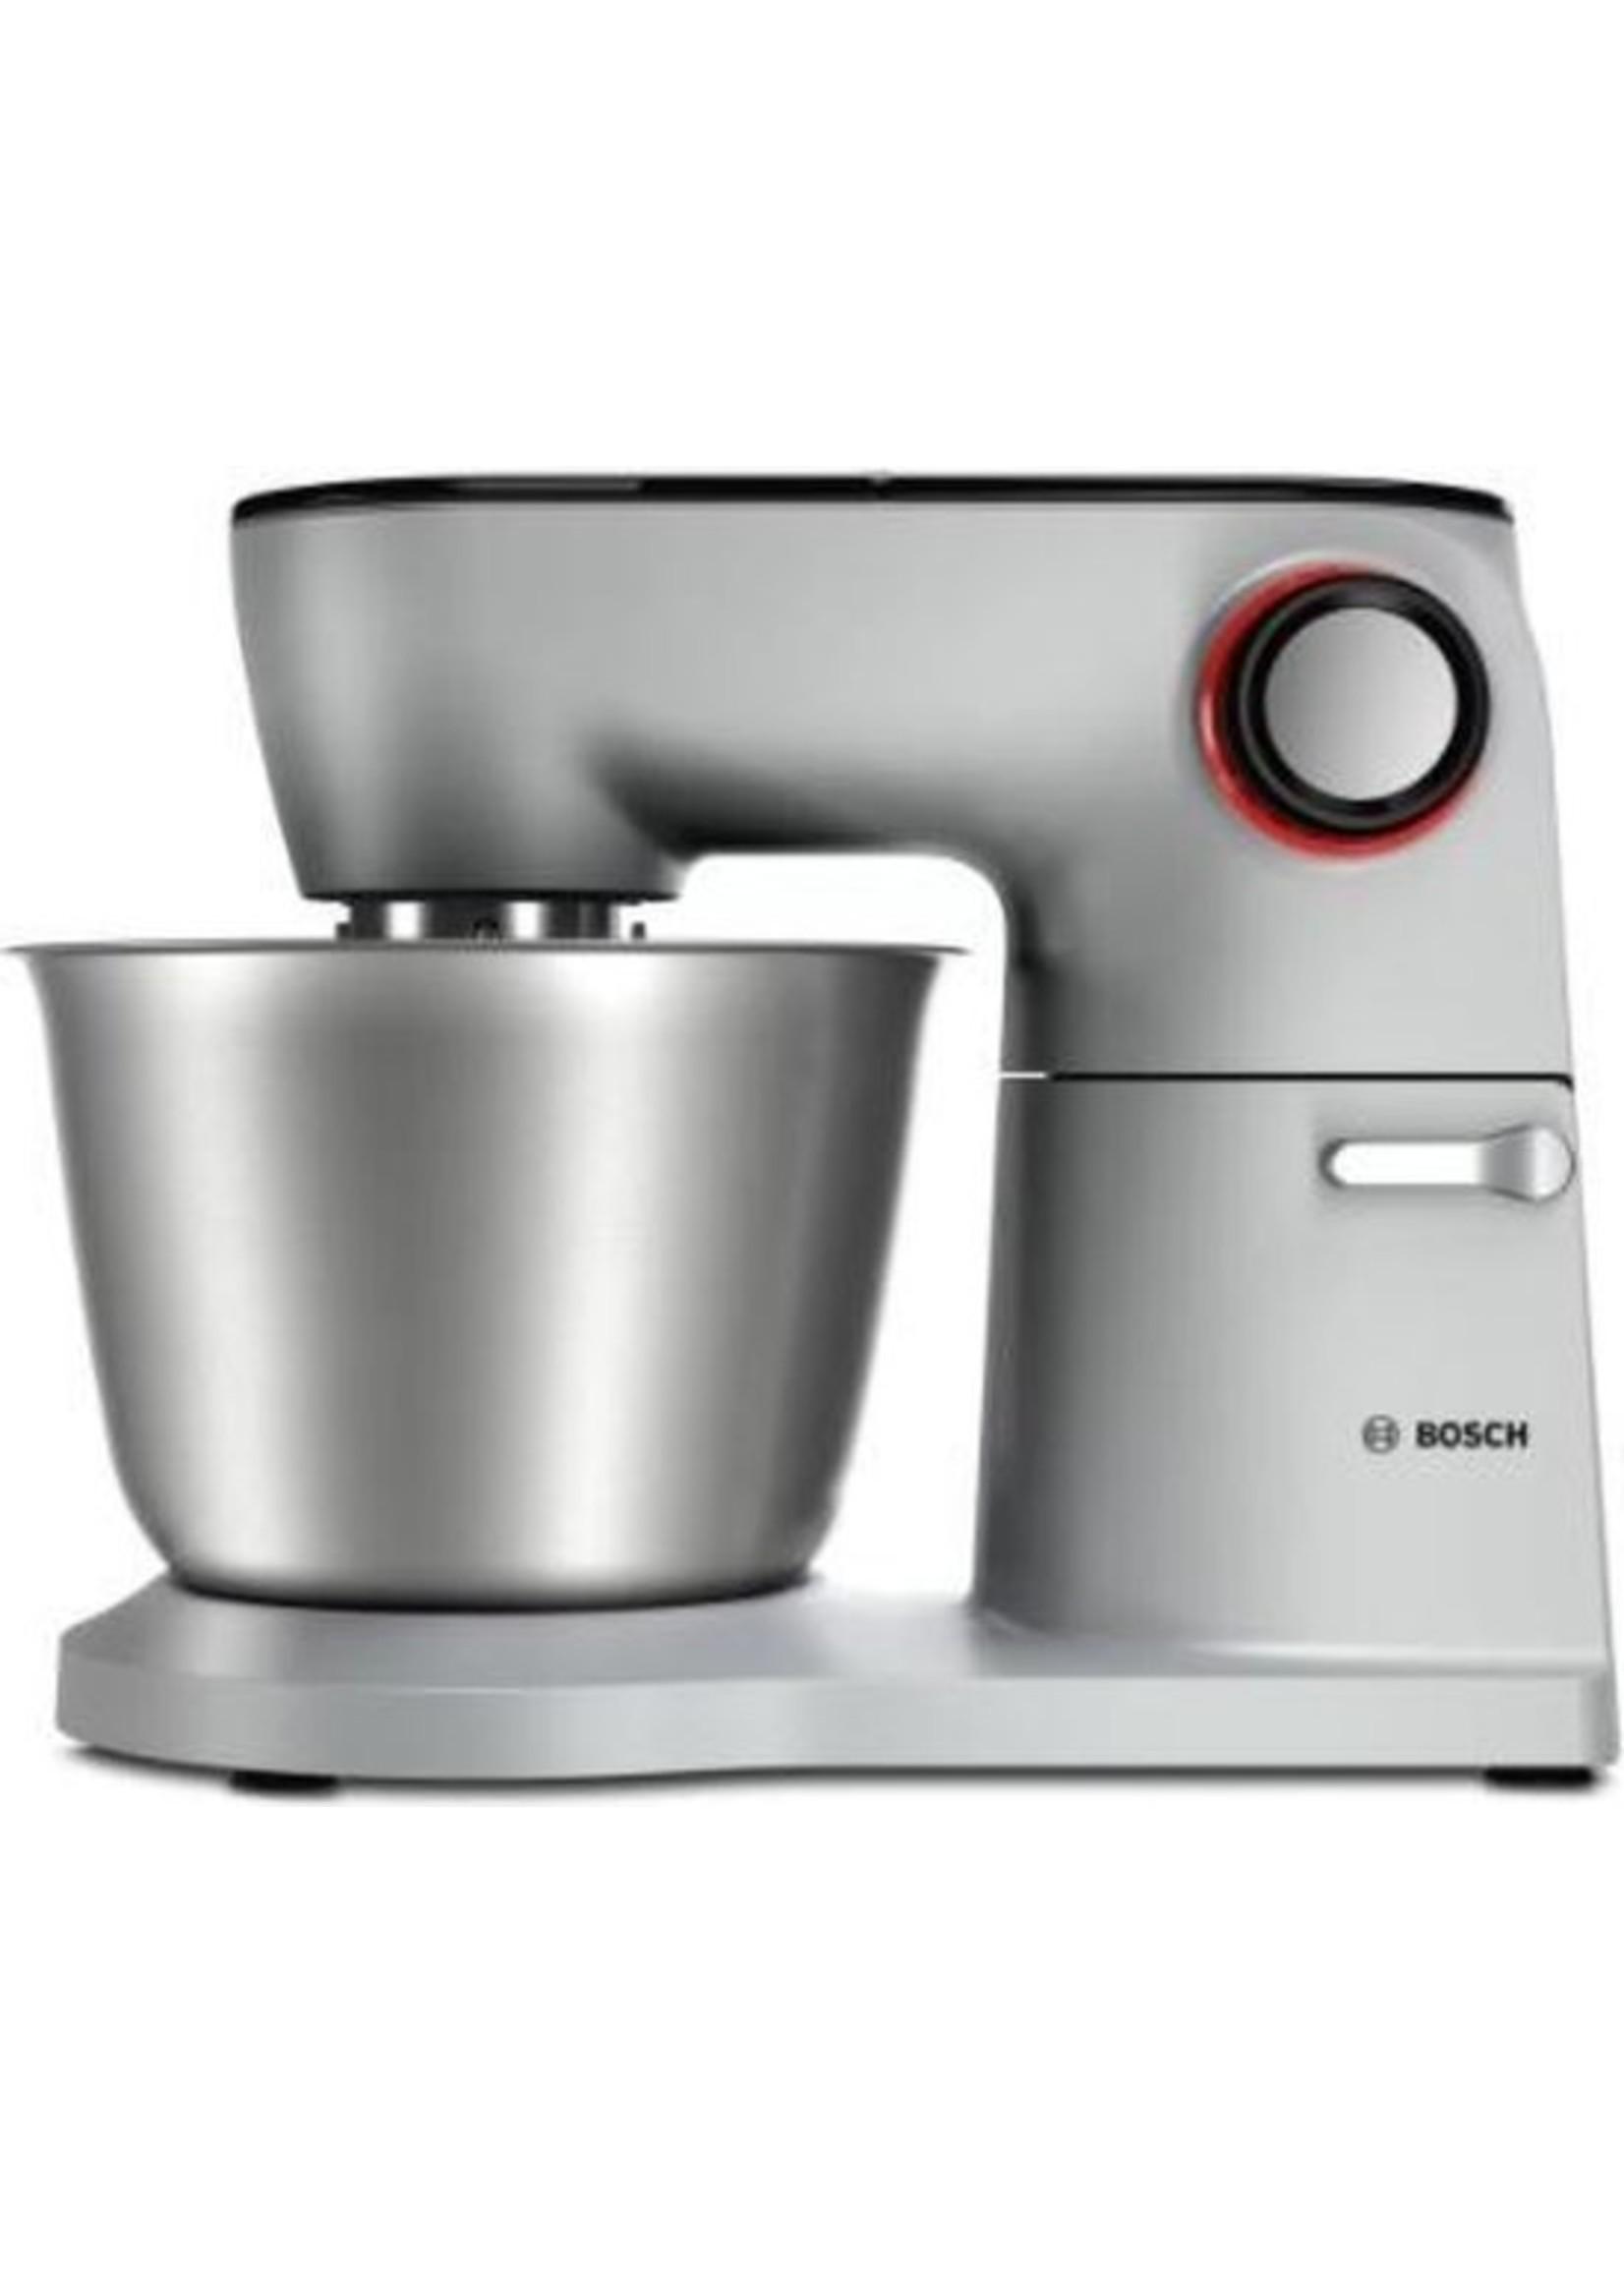 Bosch Bosch MUM9D33S11 - Foodprocessor koopjeshoek